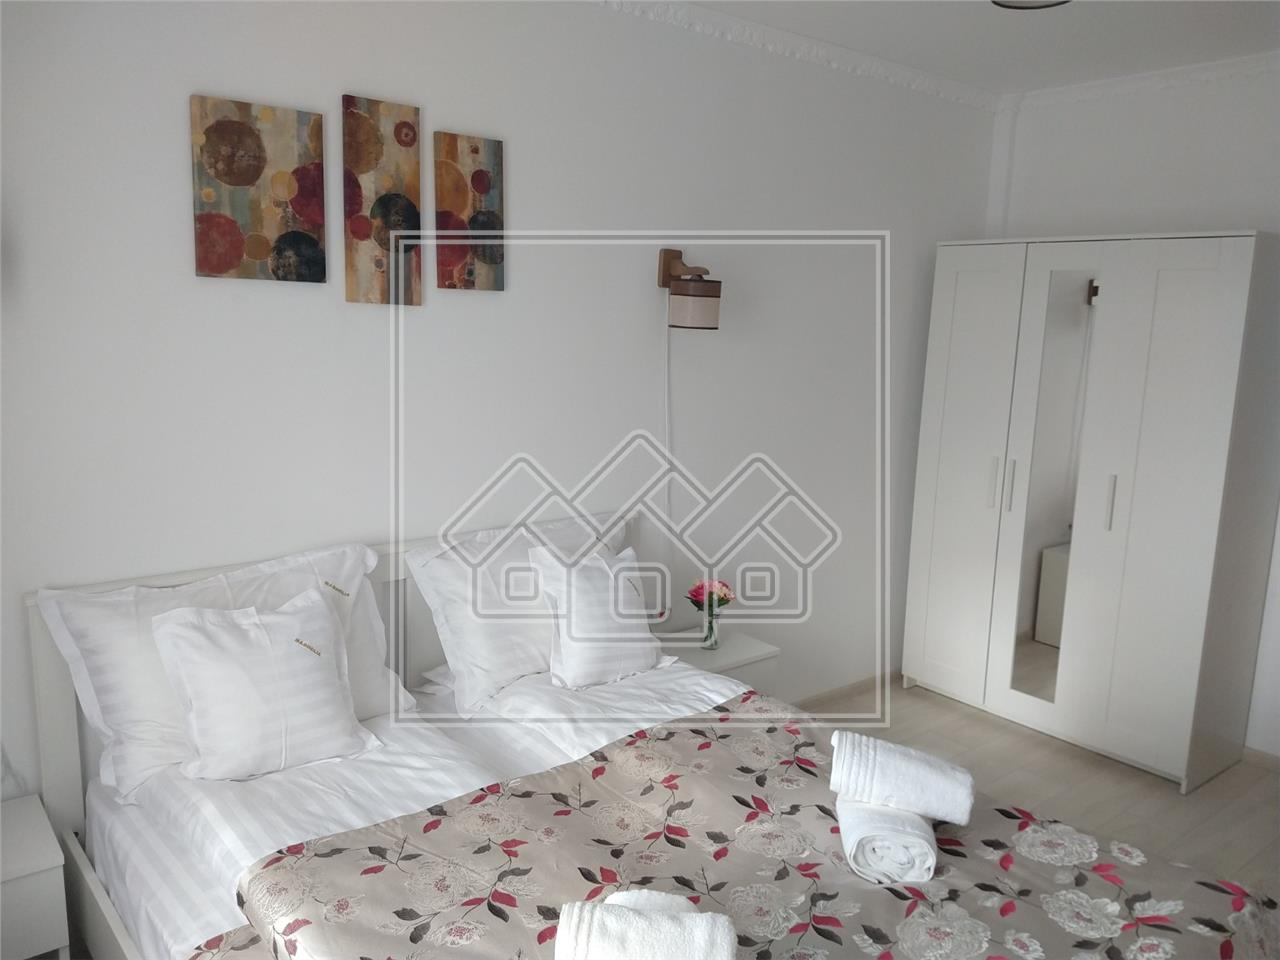 Apartament de vanzare in Sibiu -2 camere cu balcon- Calea Surii Mici